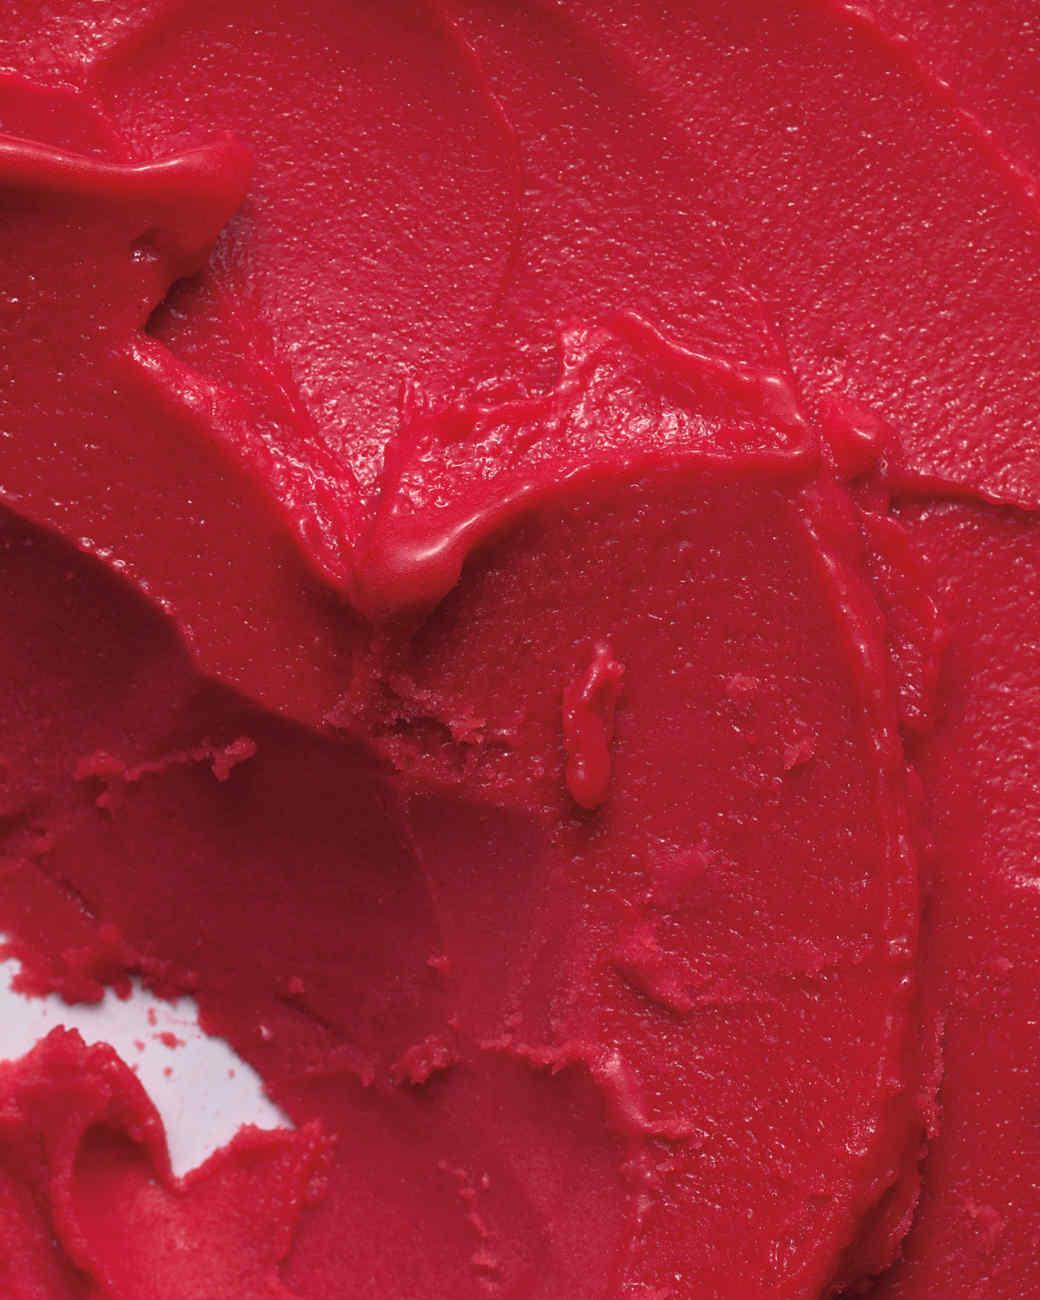 rose-raspberry-sorbet-03-mld110161.jpg